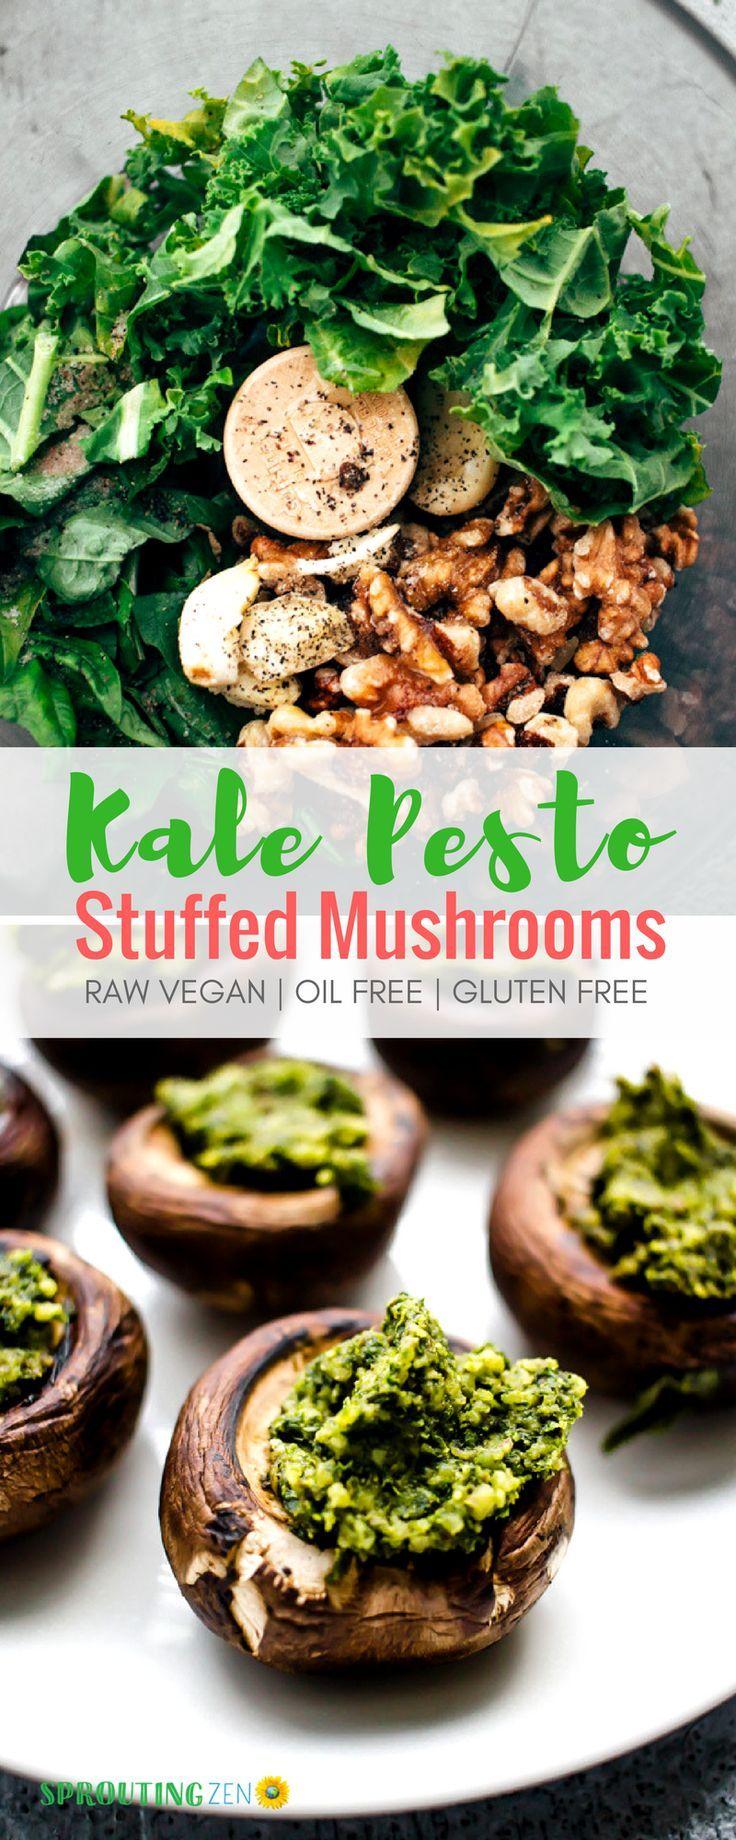 Stuffed Baby Mushrooms With Kale Pesto